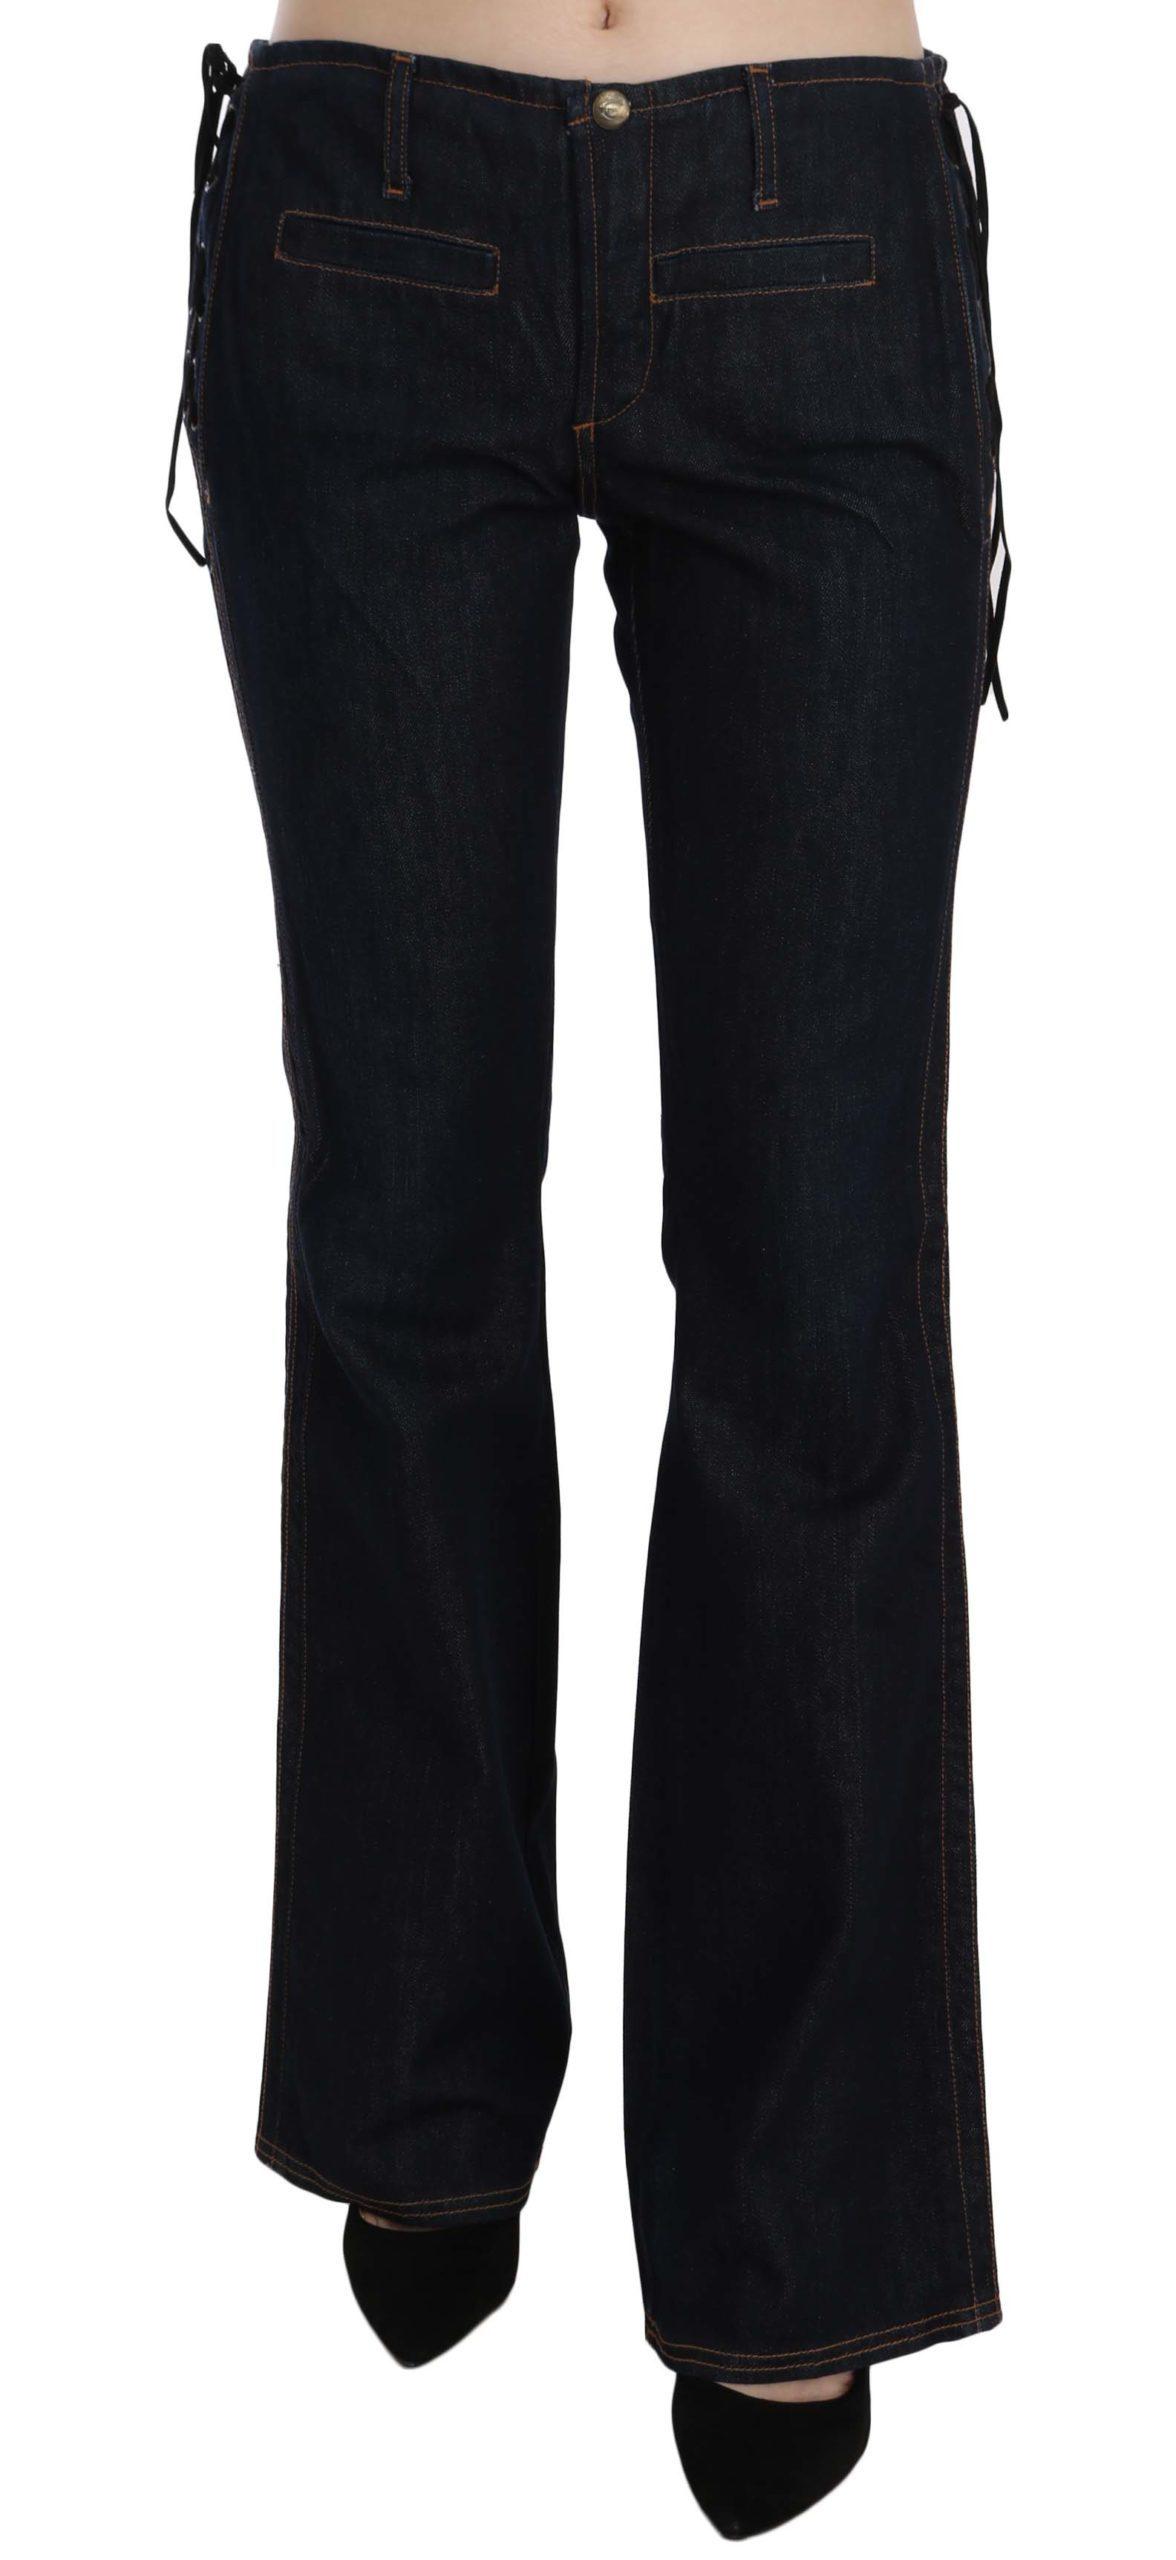 Just Cavalli Women's Low Waist Boot Cut Denim Trouser Blue PAN70372 - W26